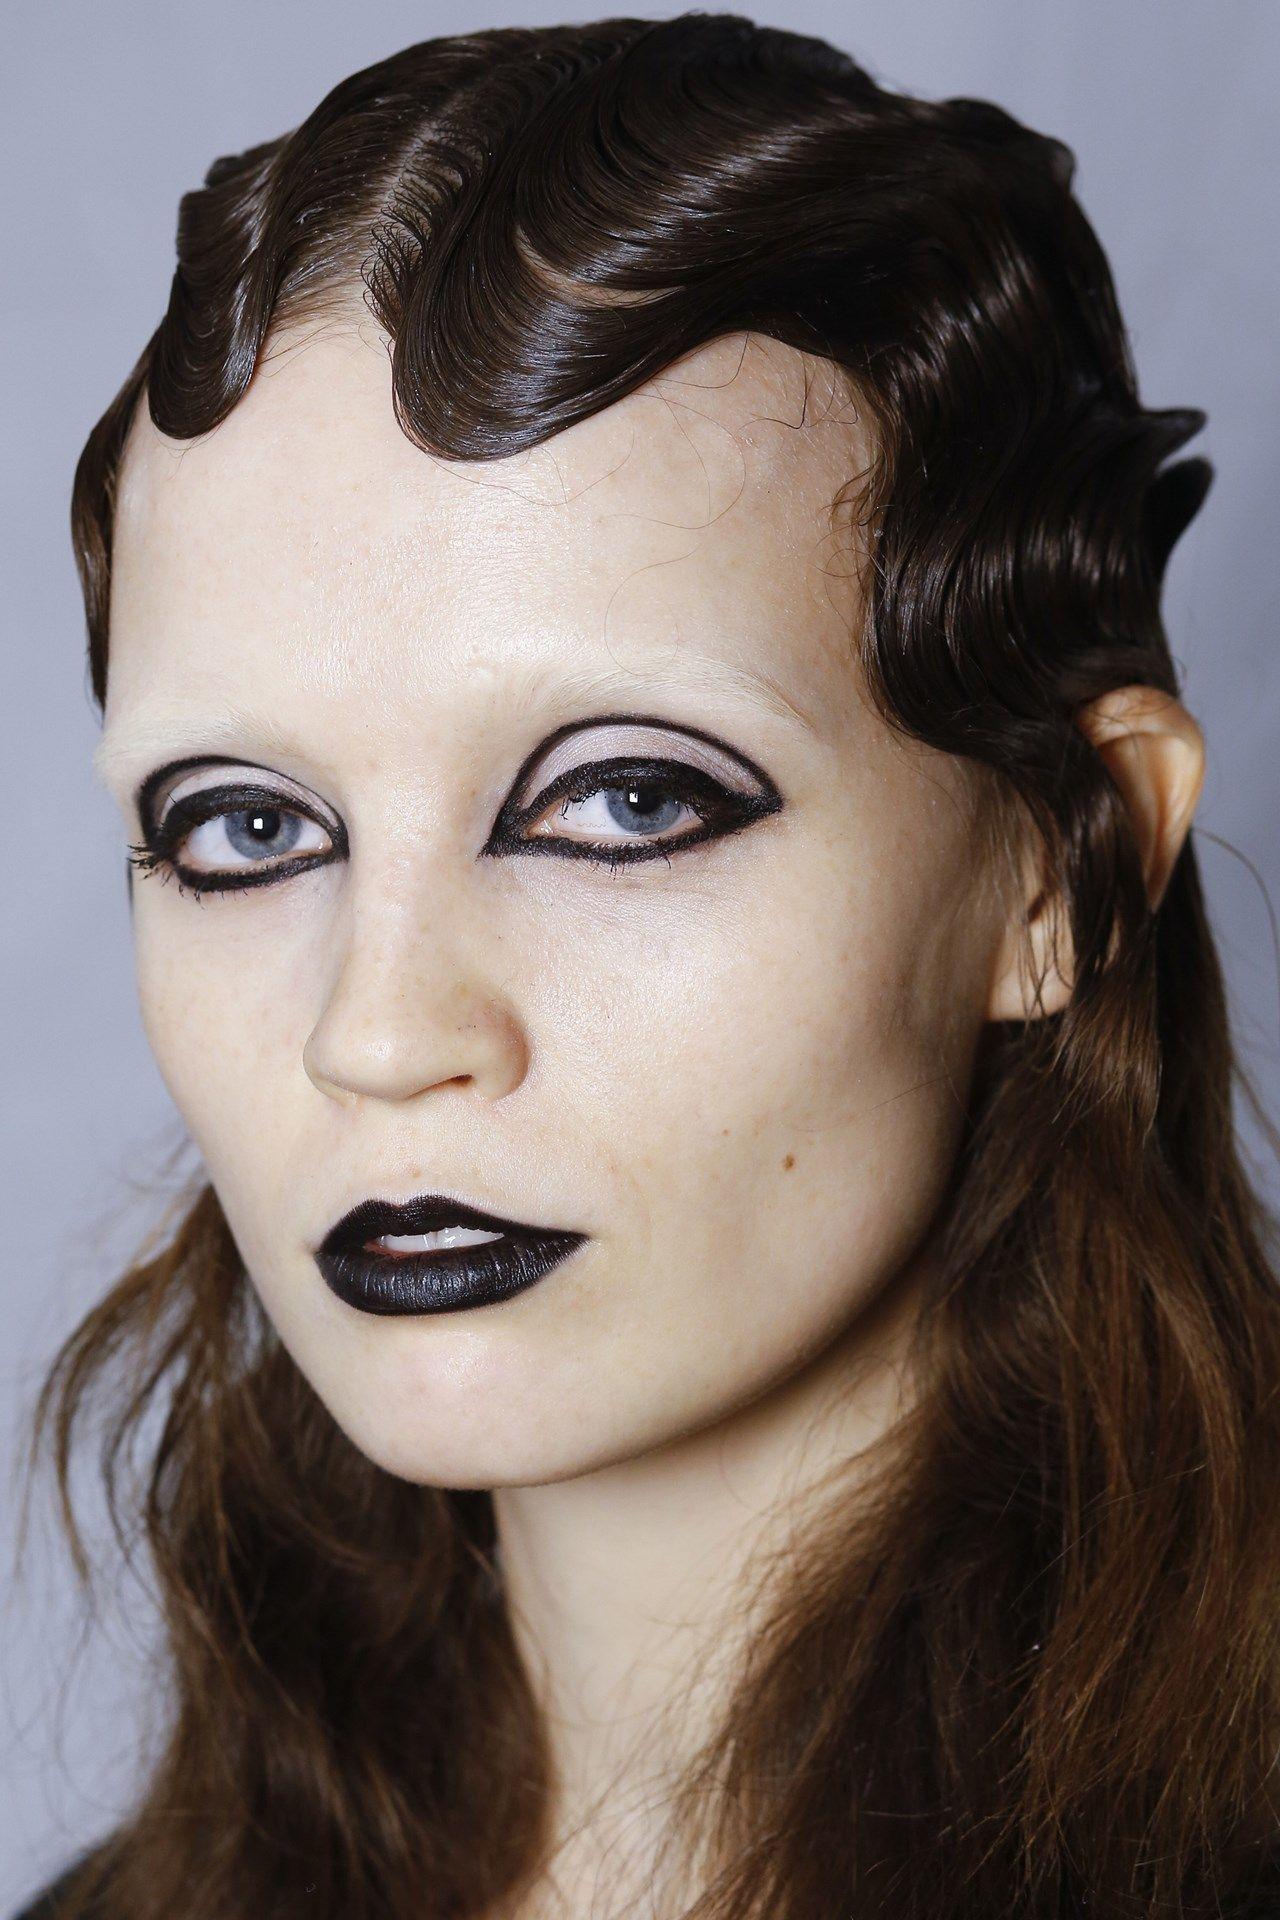 Marc Jacobs Autumn/Winter 2016 ReadyToWear Catwalk